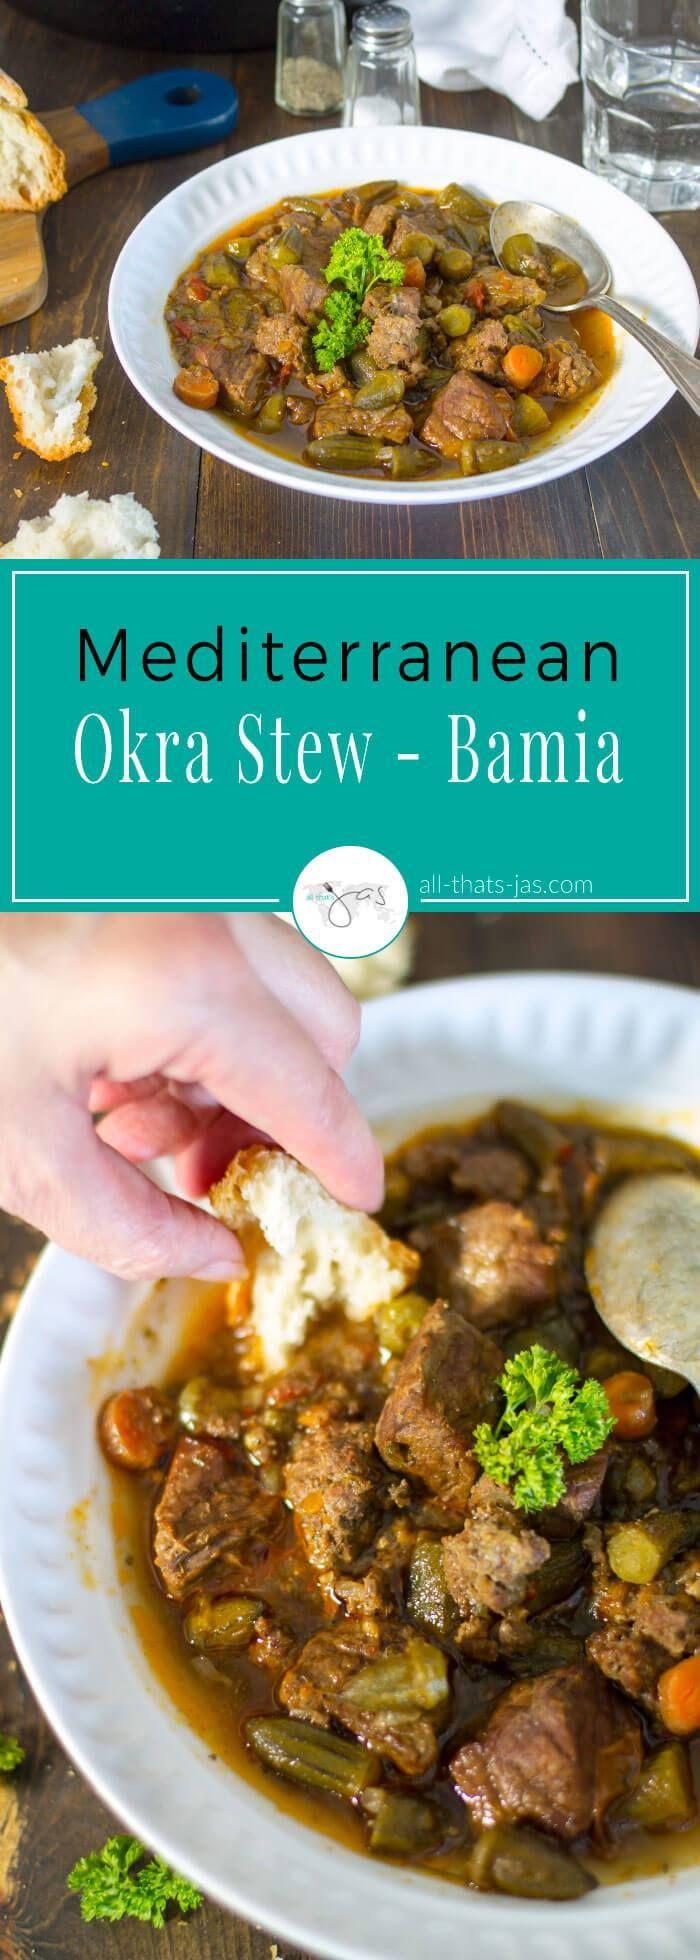 27 best Mid East food images on Pinterest | Arabic food, Middle ...